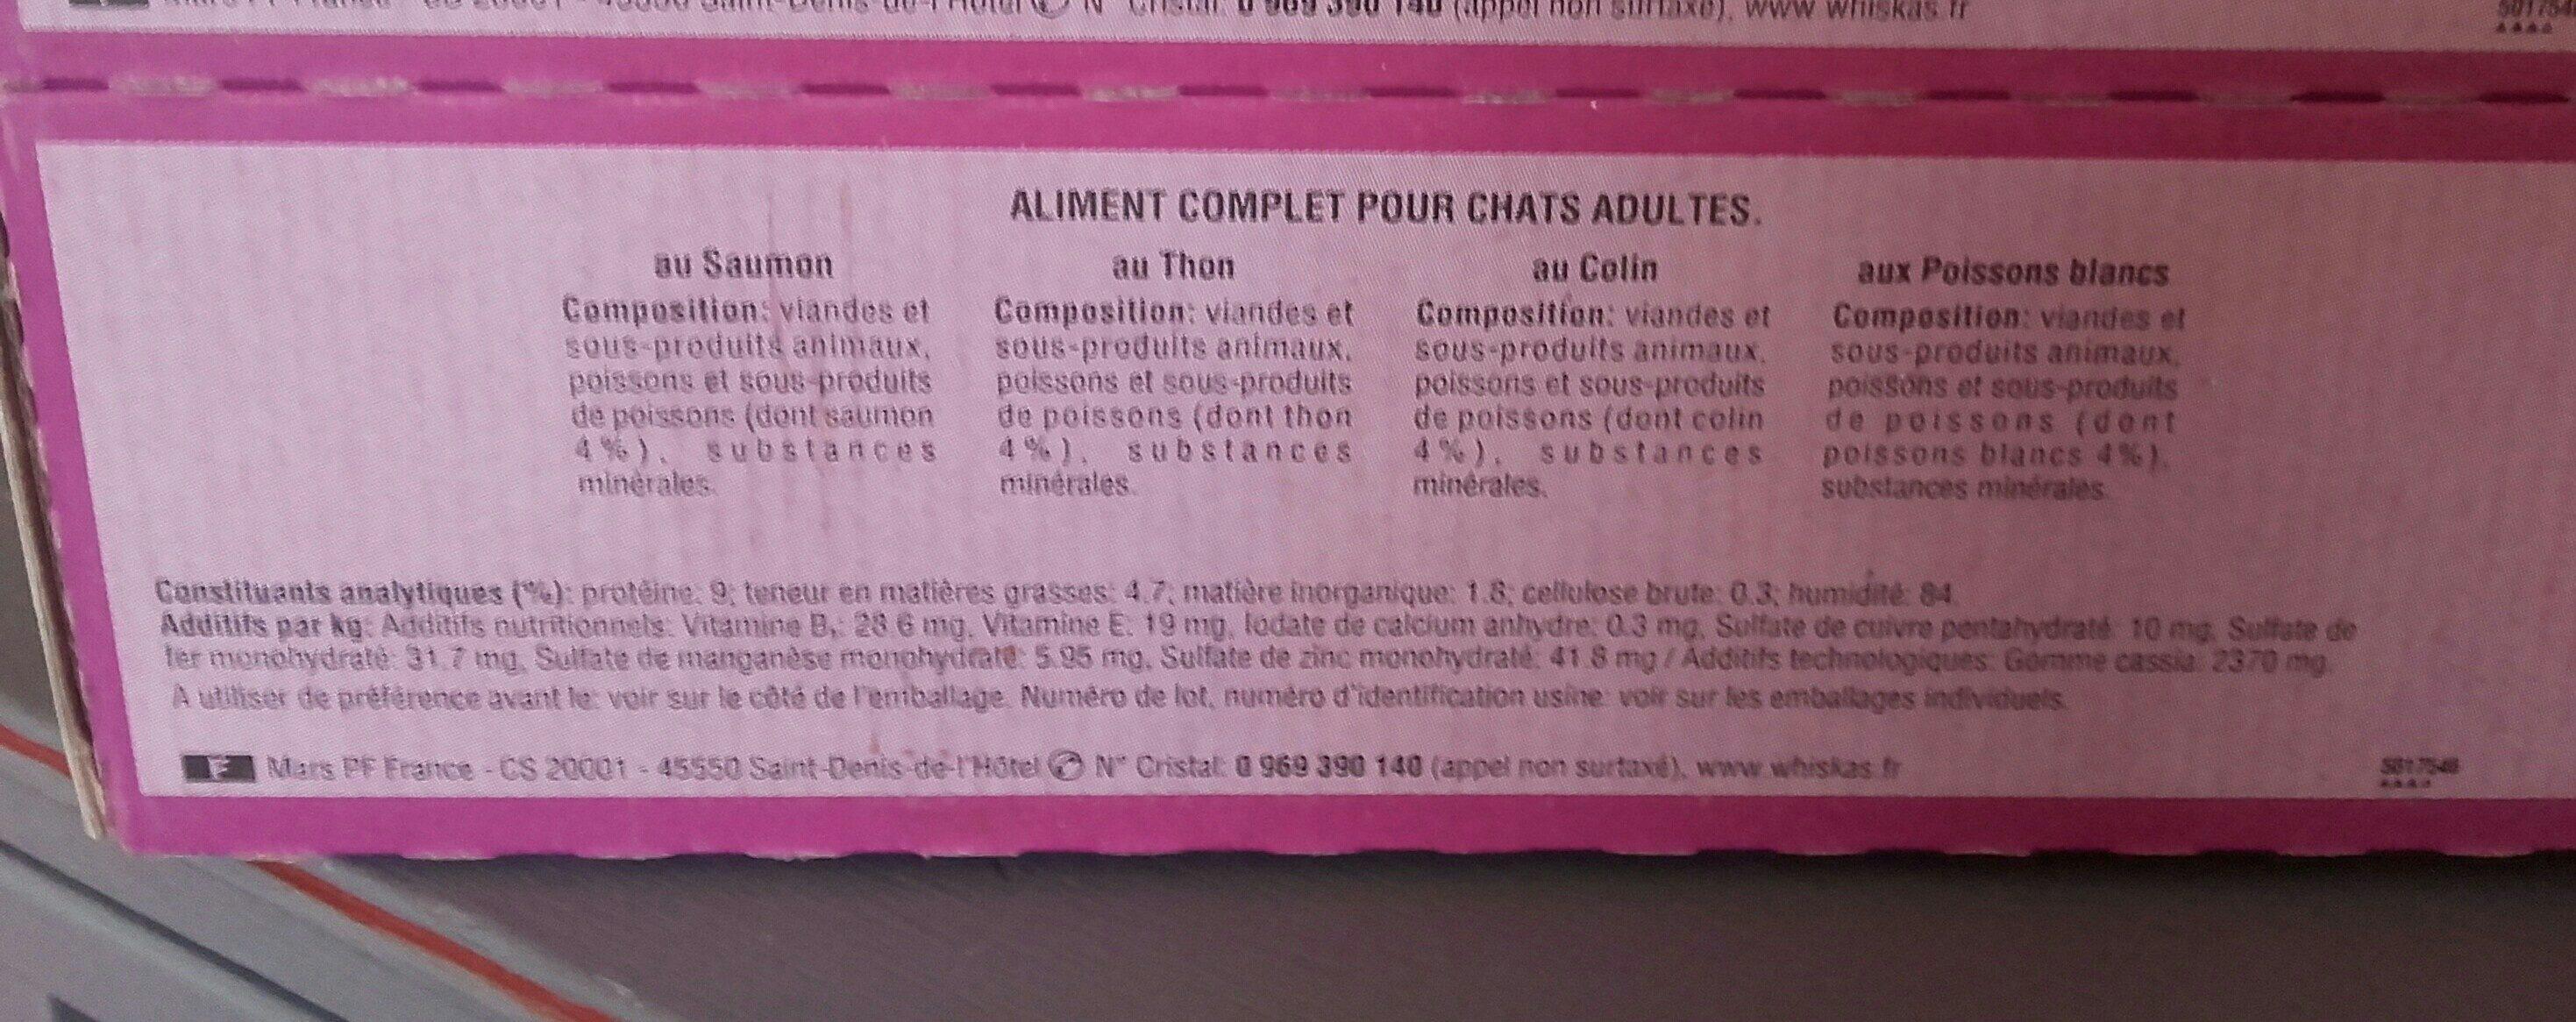 Sachets fraîcheur - Ingredients - fr